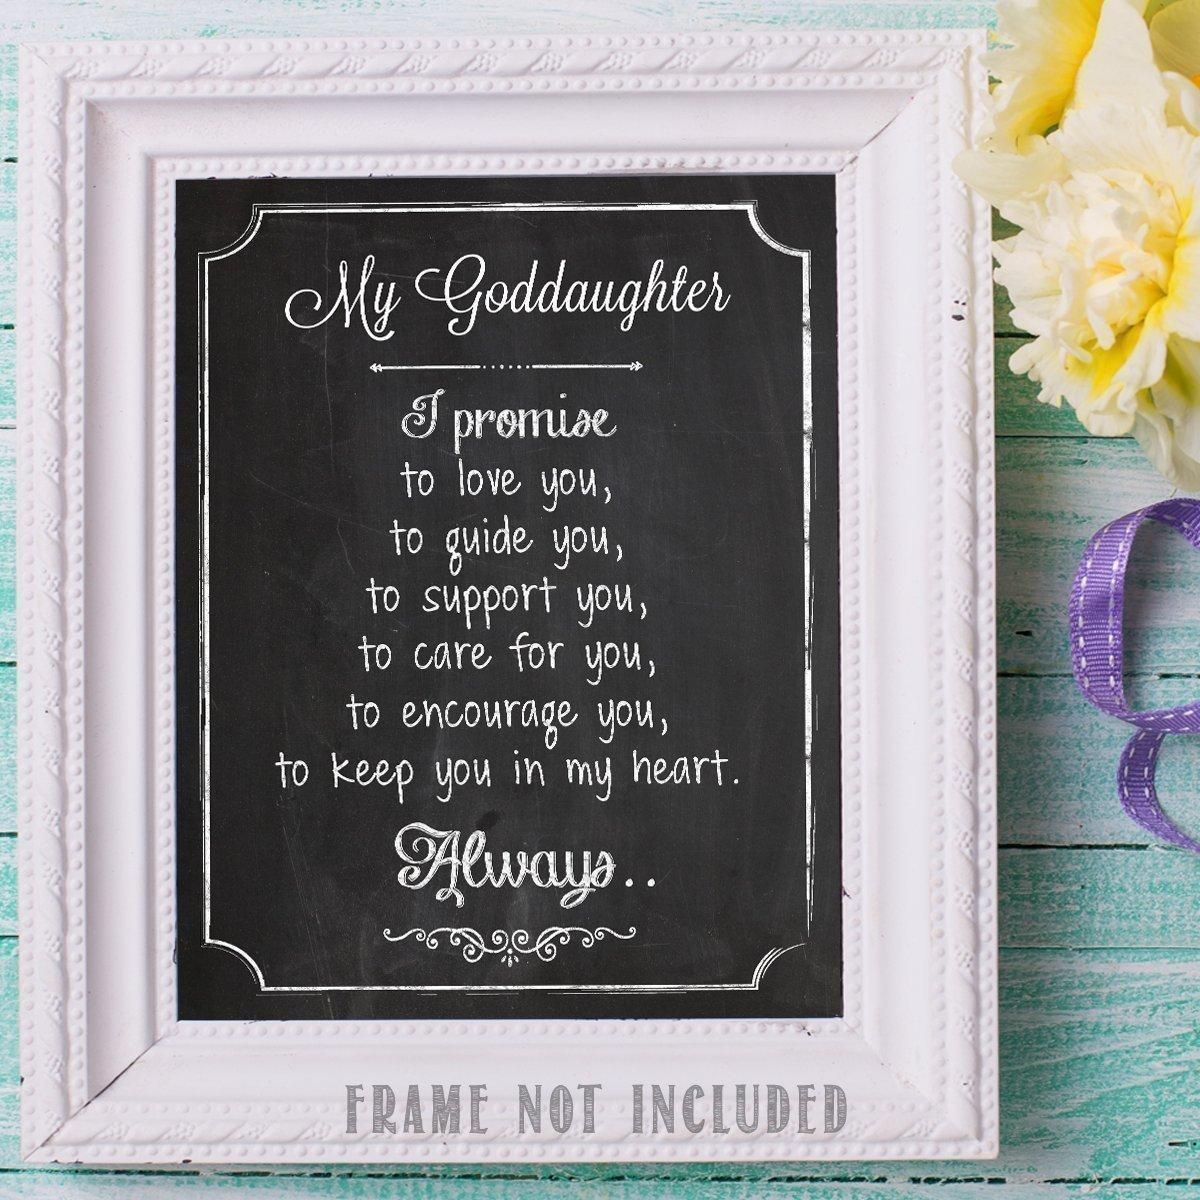 Amazon.com: My Goddaughter Chalkboard Look - 11x14 Unframed ...